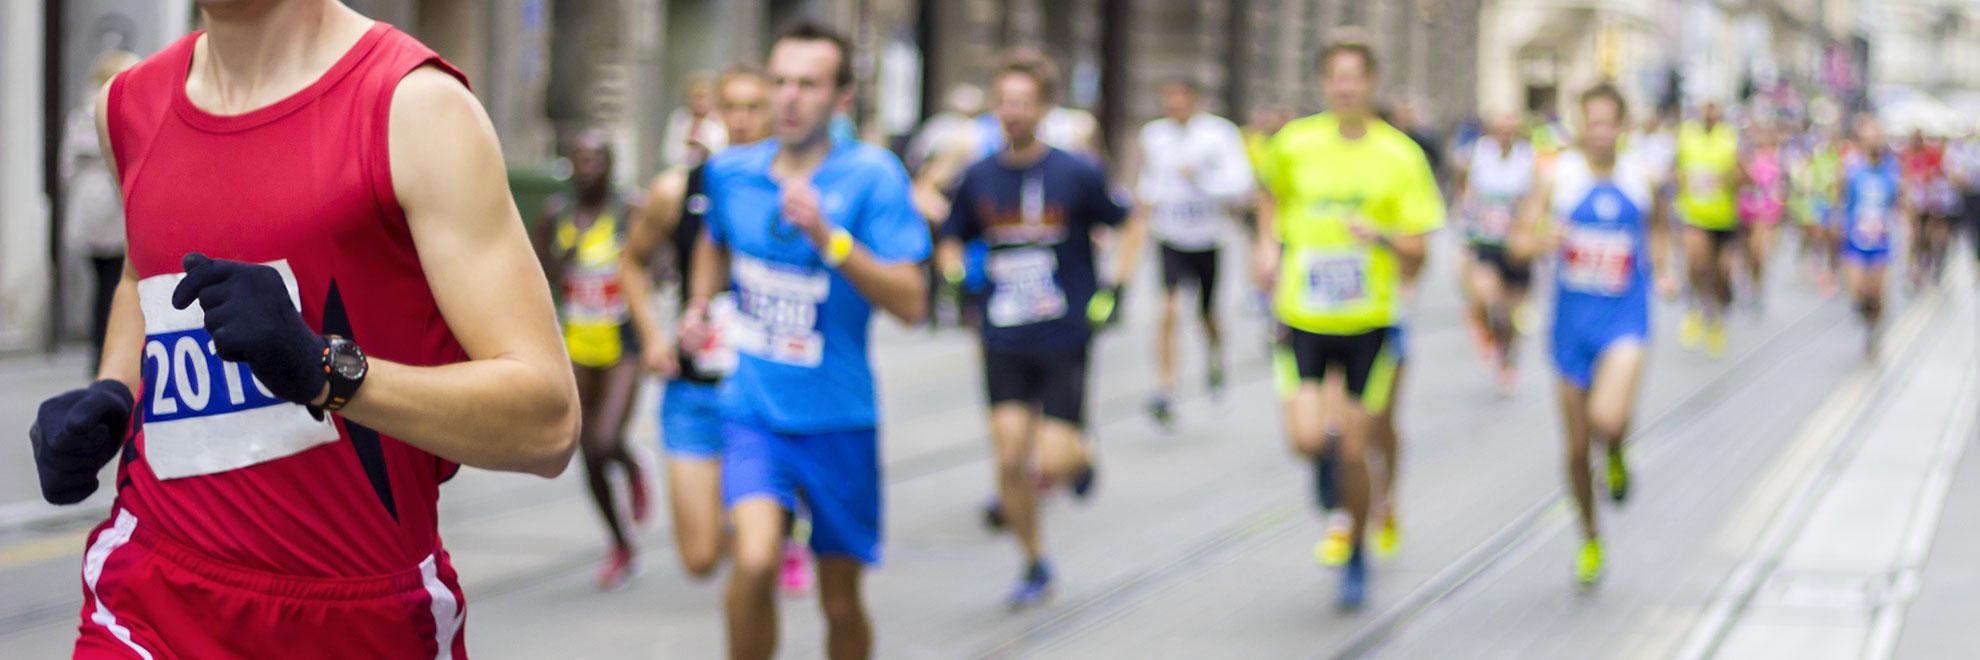 brescia marathon